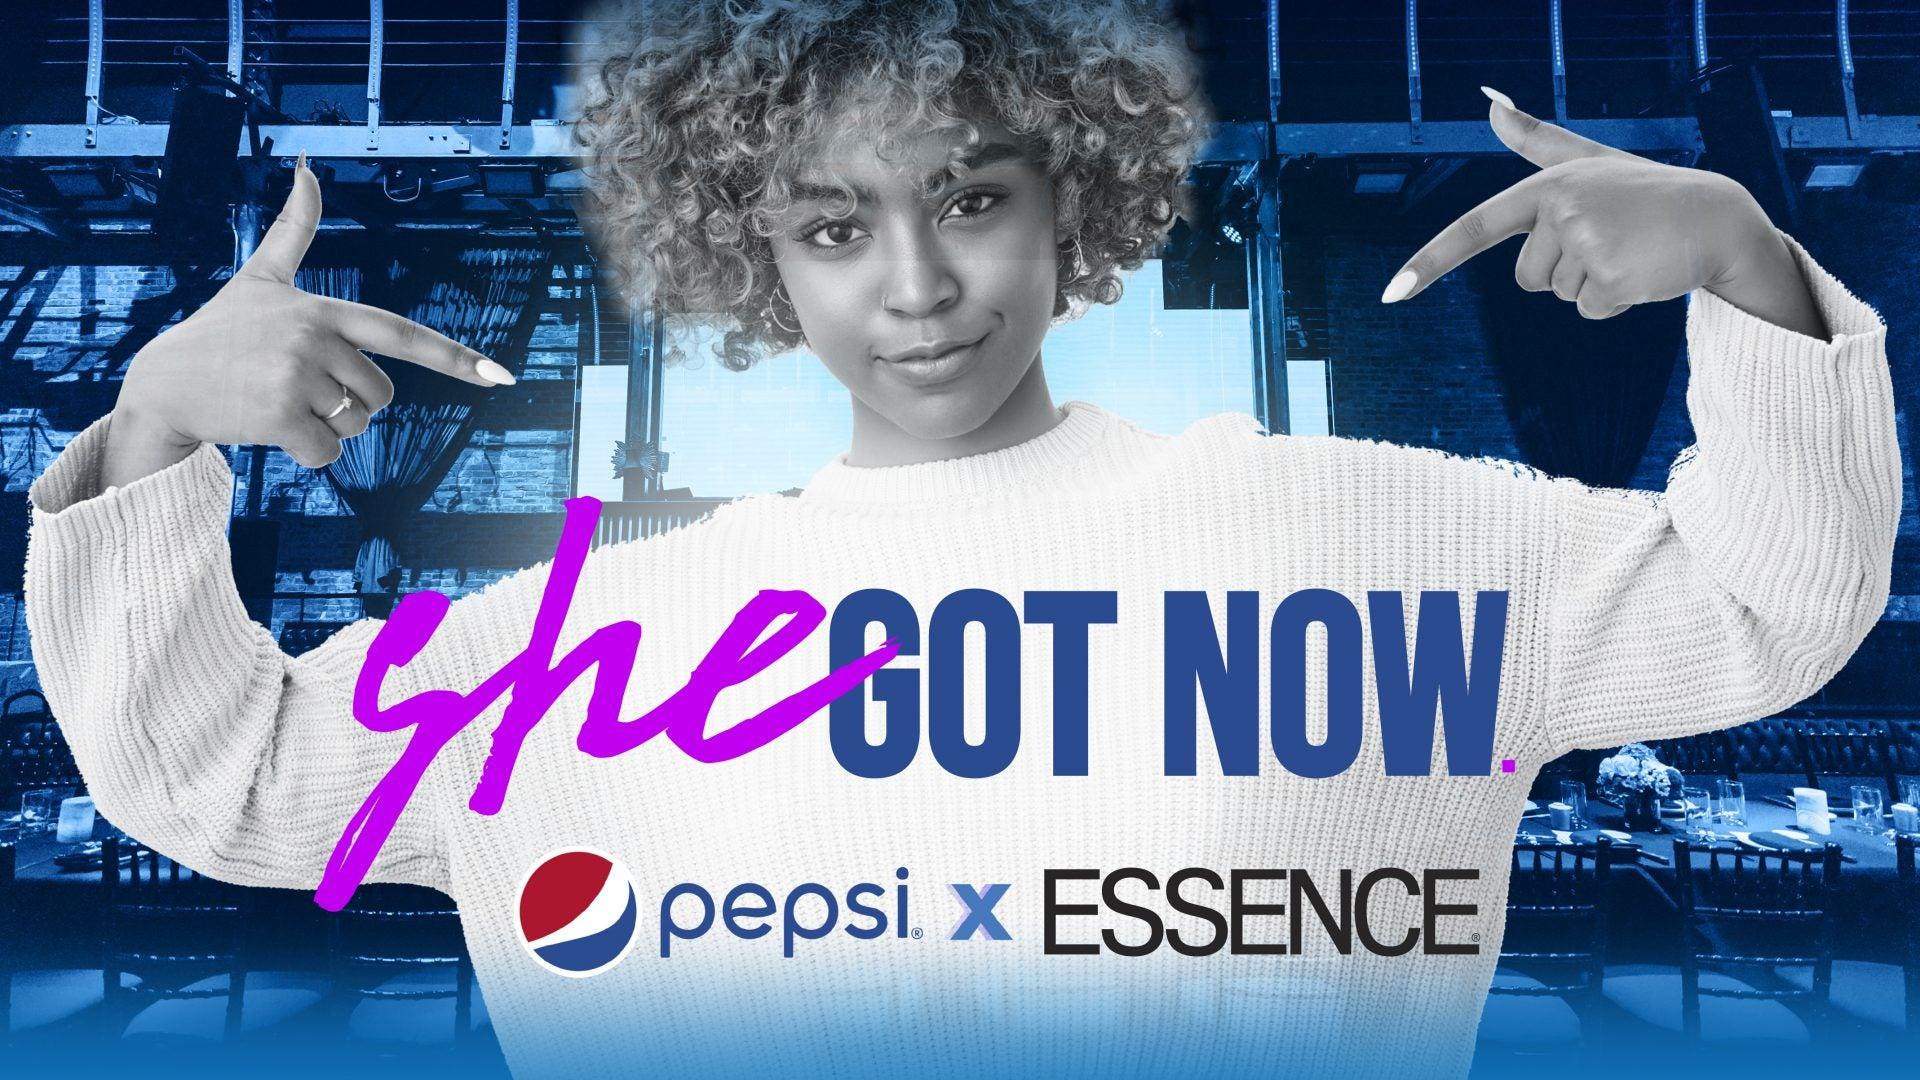 #SheGotNow: ESSENCE, PepsiCo To Empower HBCU Students Through 2020 Historically Better Internship Program